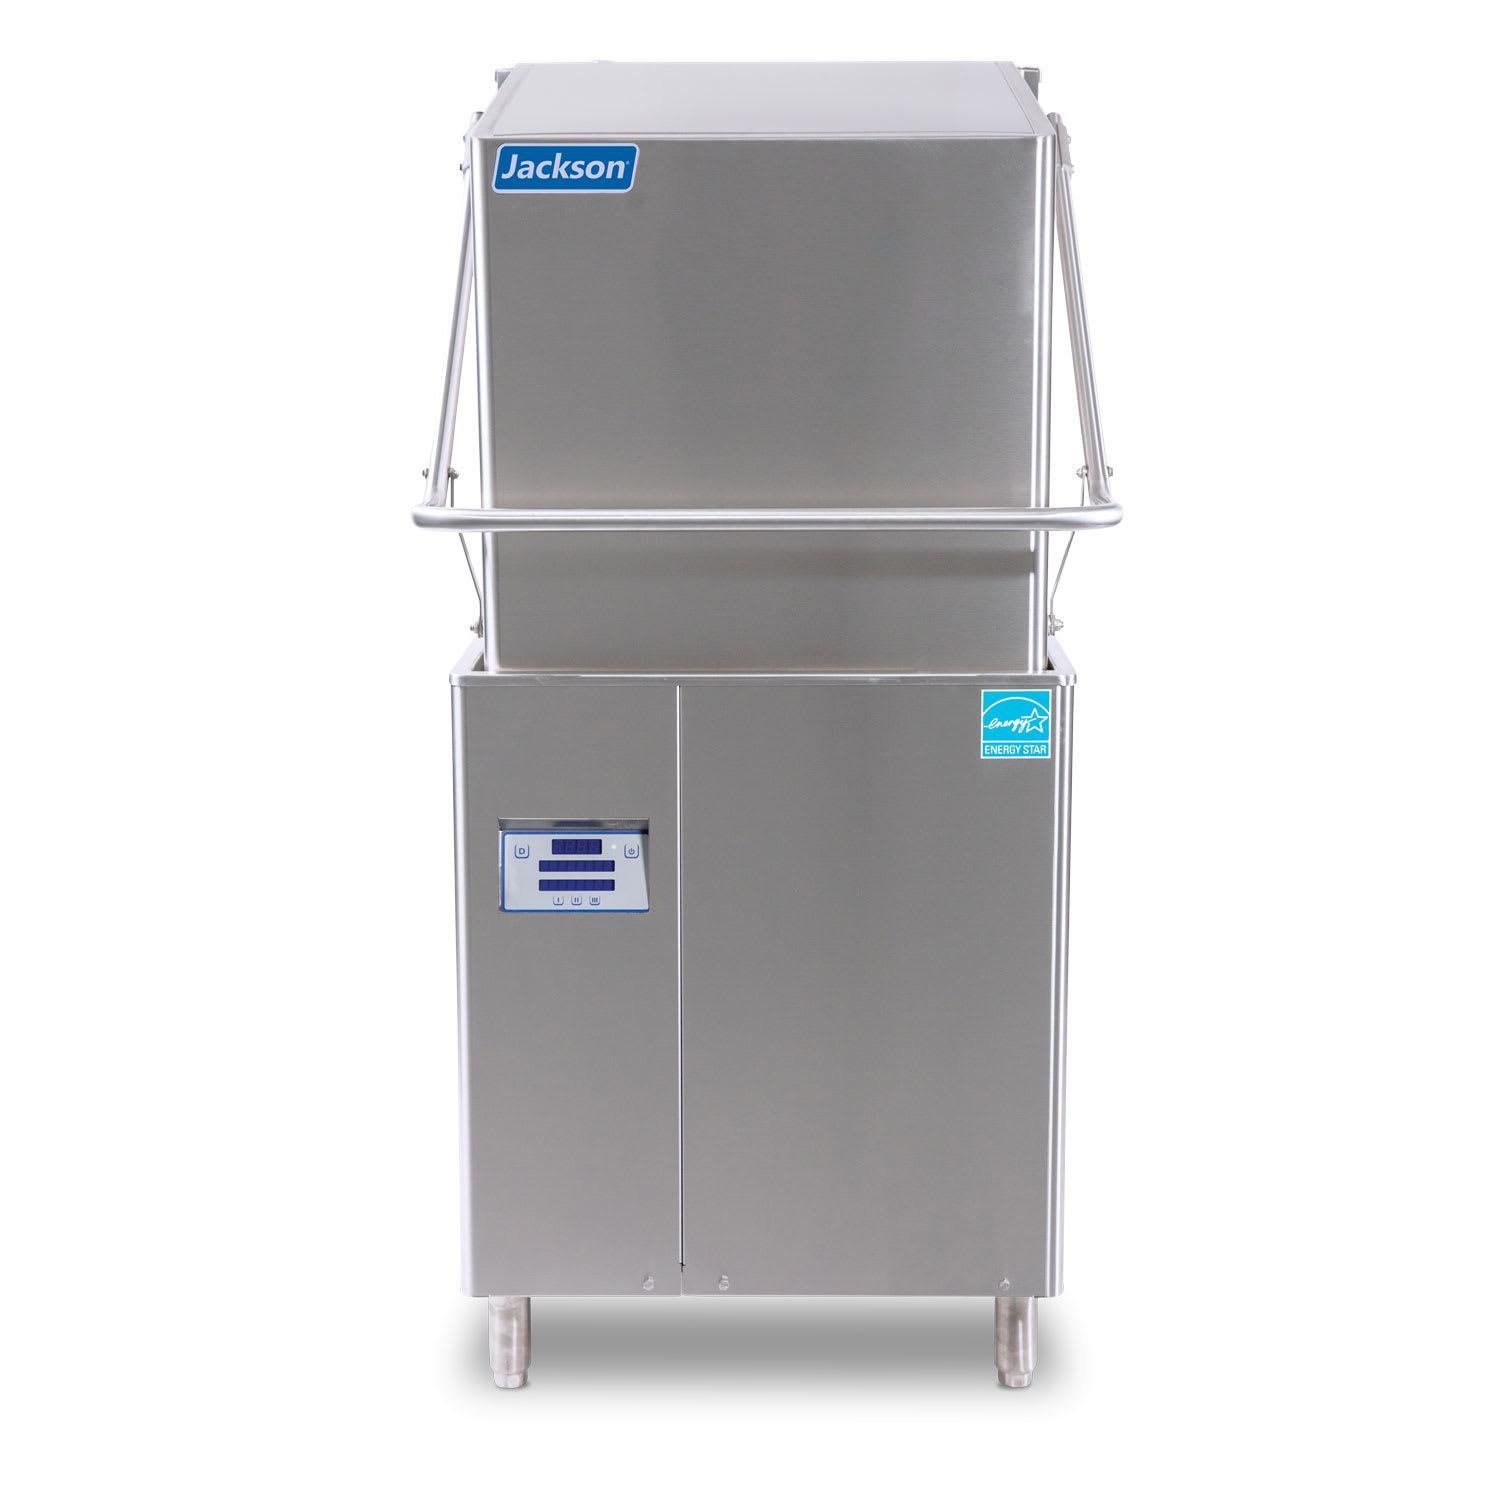 Jackson DYNATEMP High Temp Door-Type Dishwasher w/ Built-In Booster, 208v/3ph